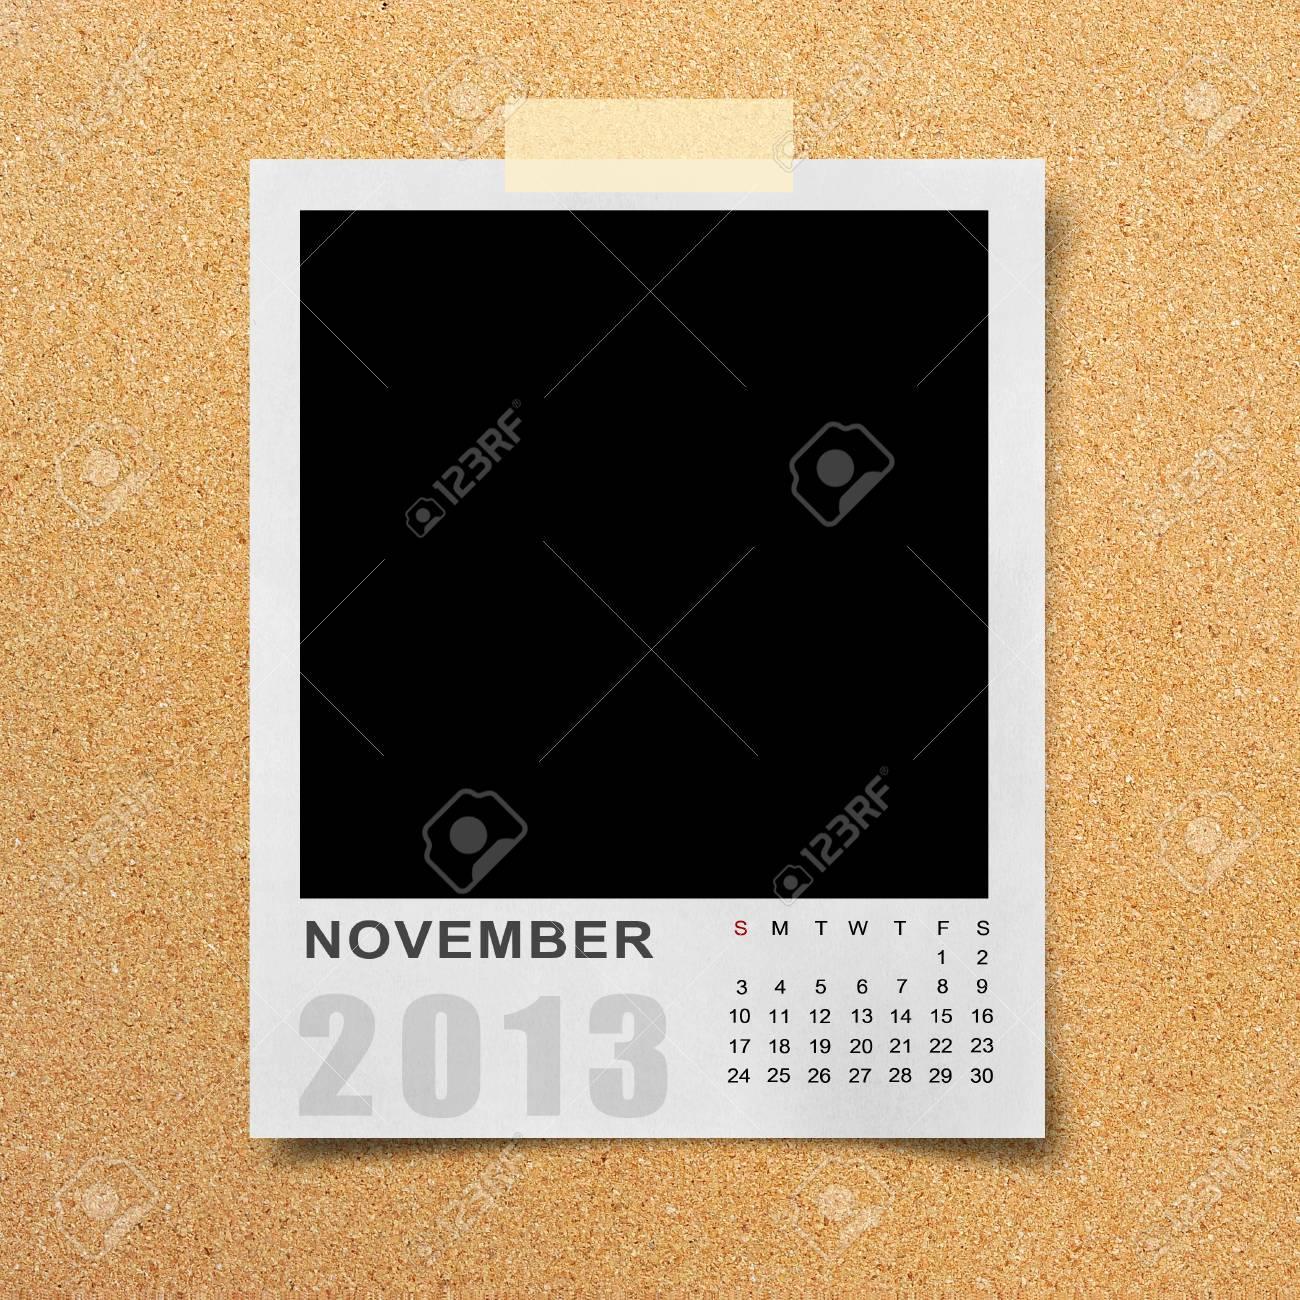 Calendar 2013 on blank photo background. Stock Photo - 16138706